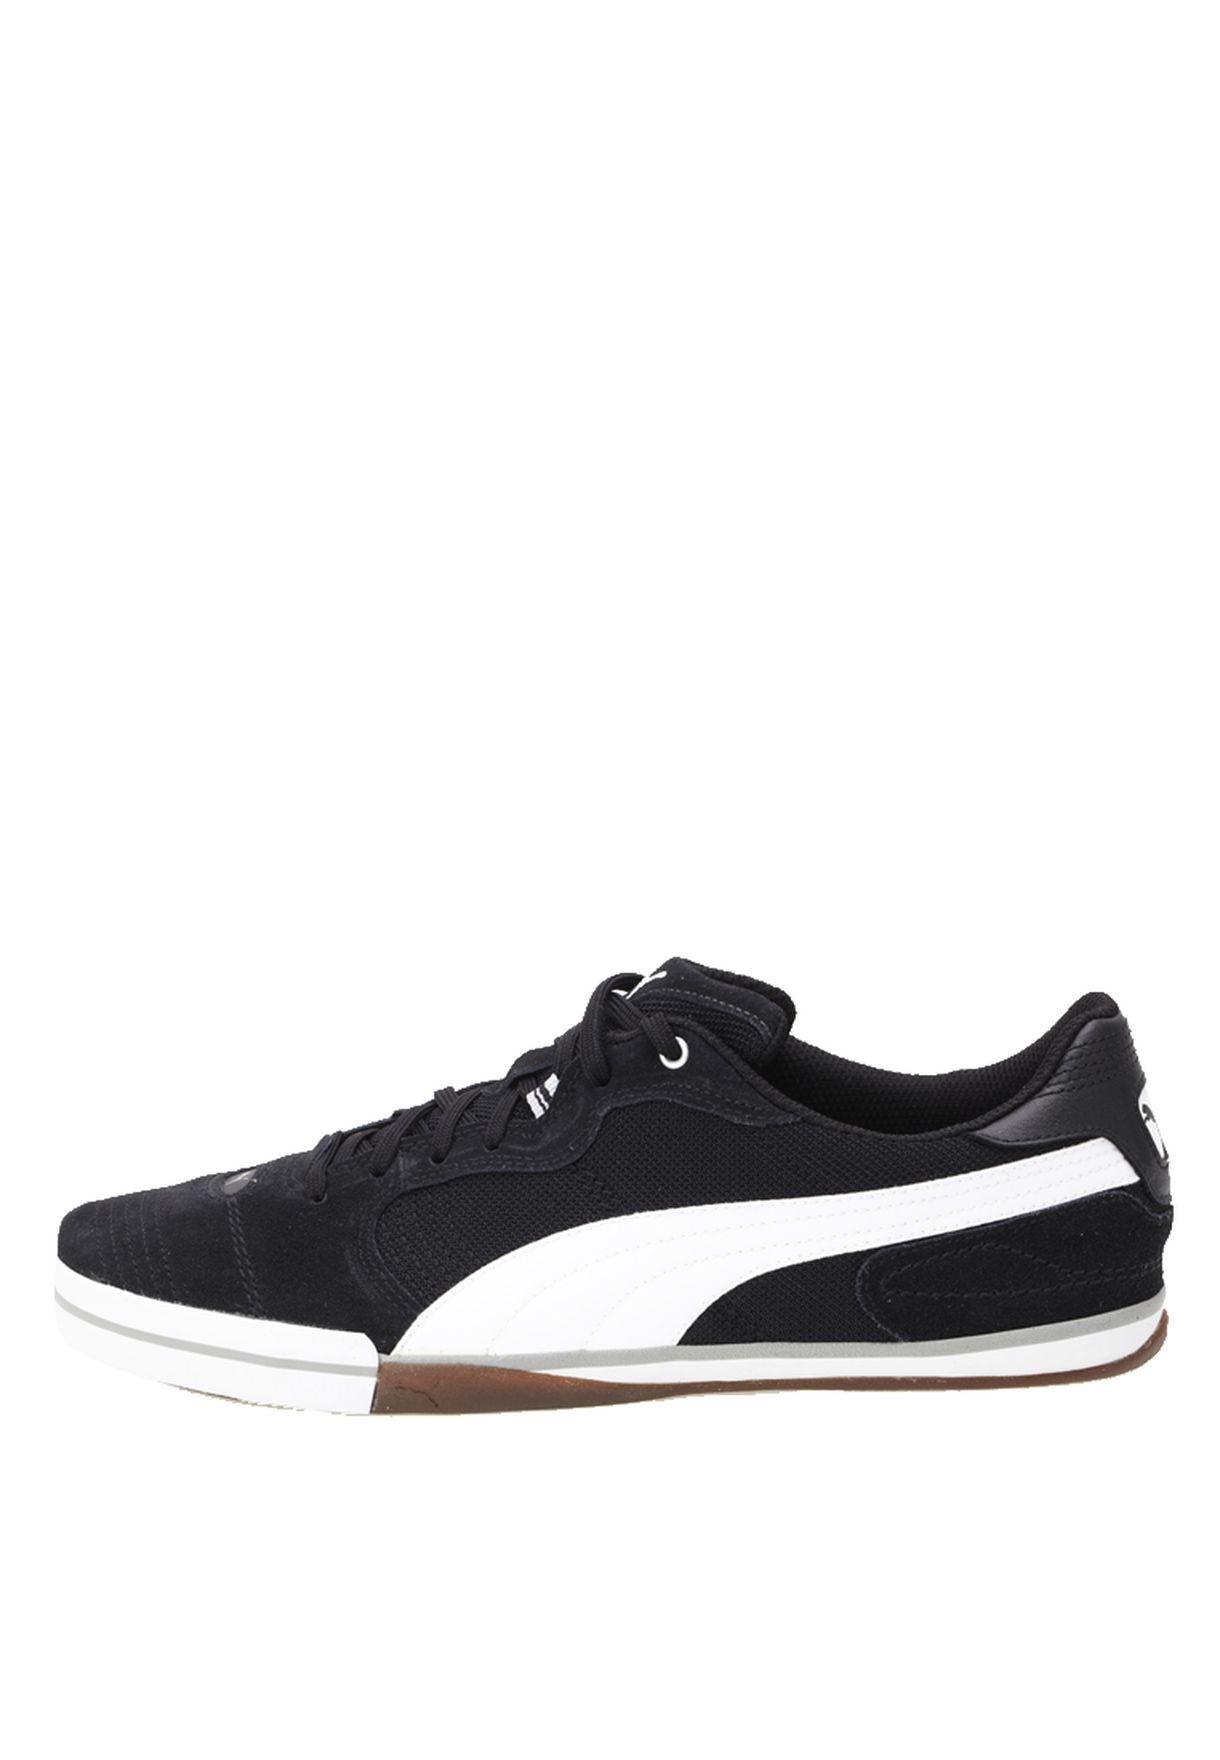 42c81b122ea Shop PUMA black Esito Vulc Sala Sneakers 10203806 for Men in ...